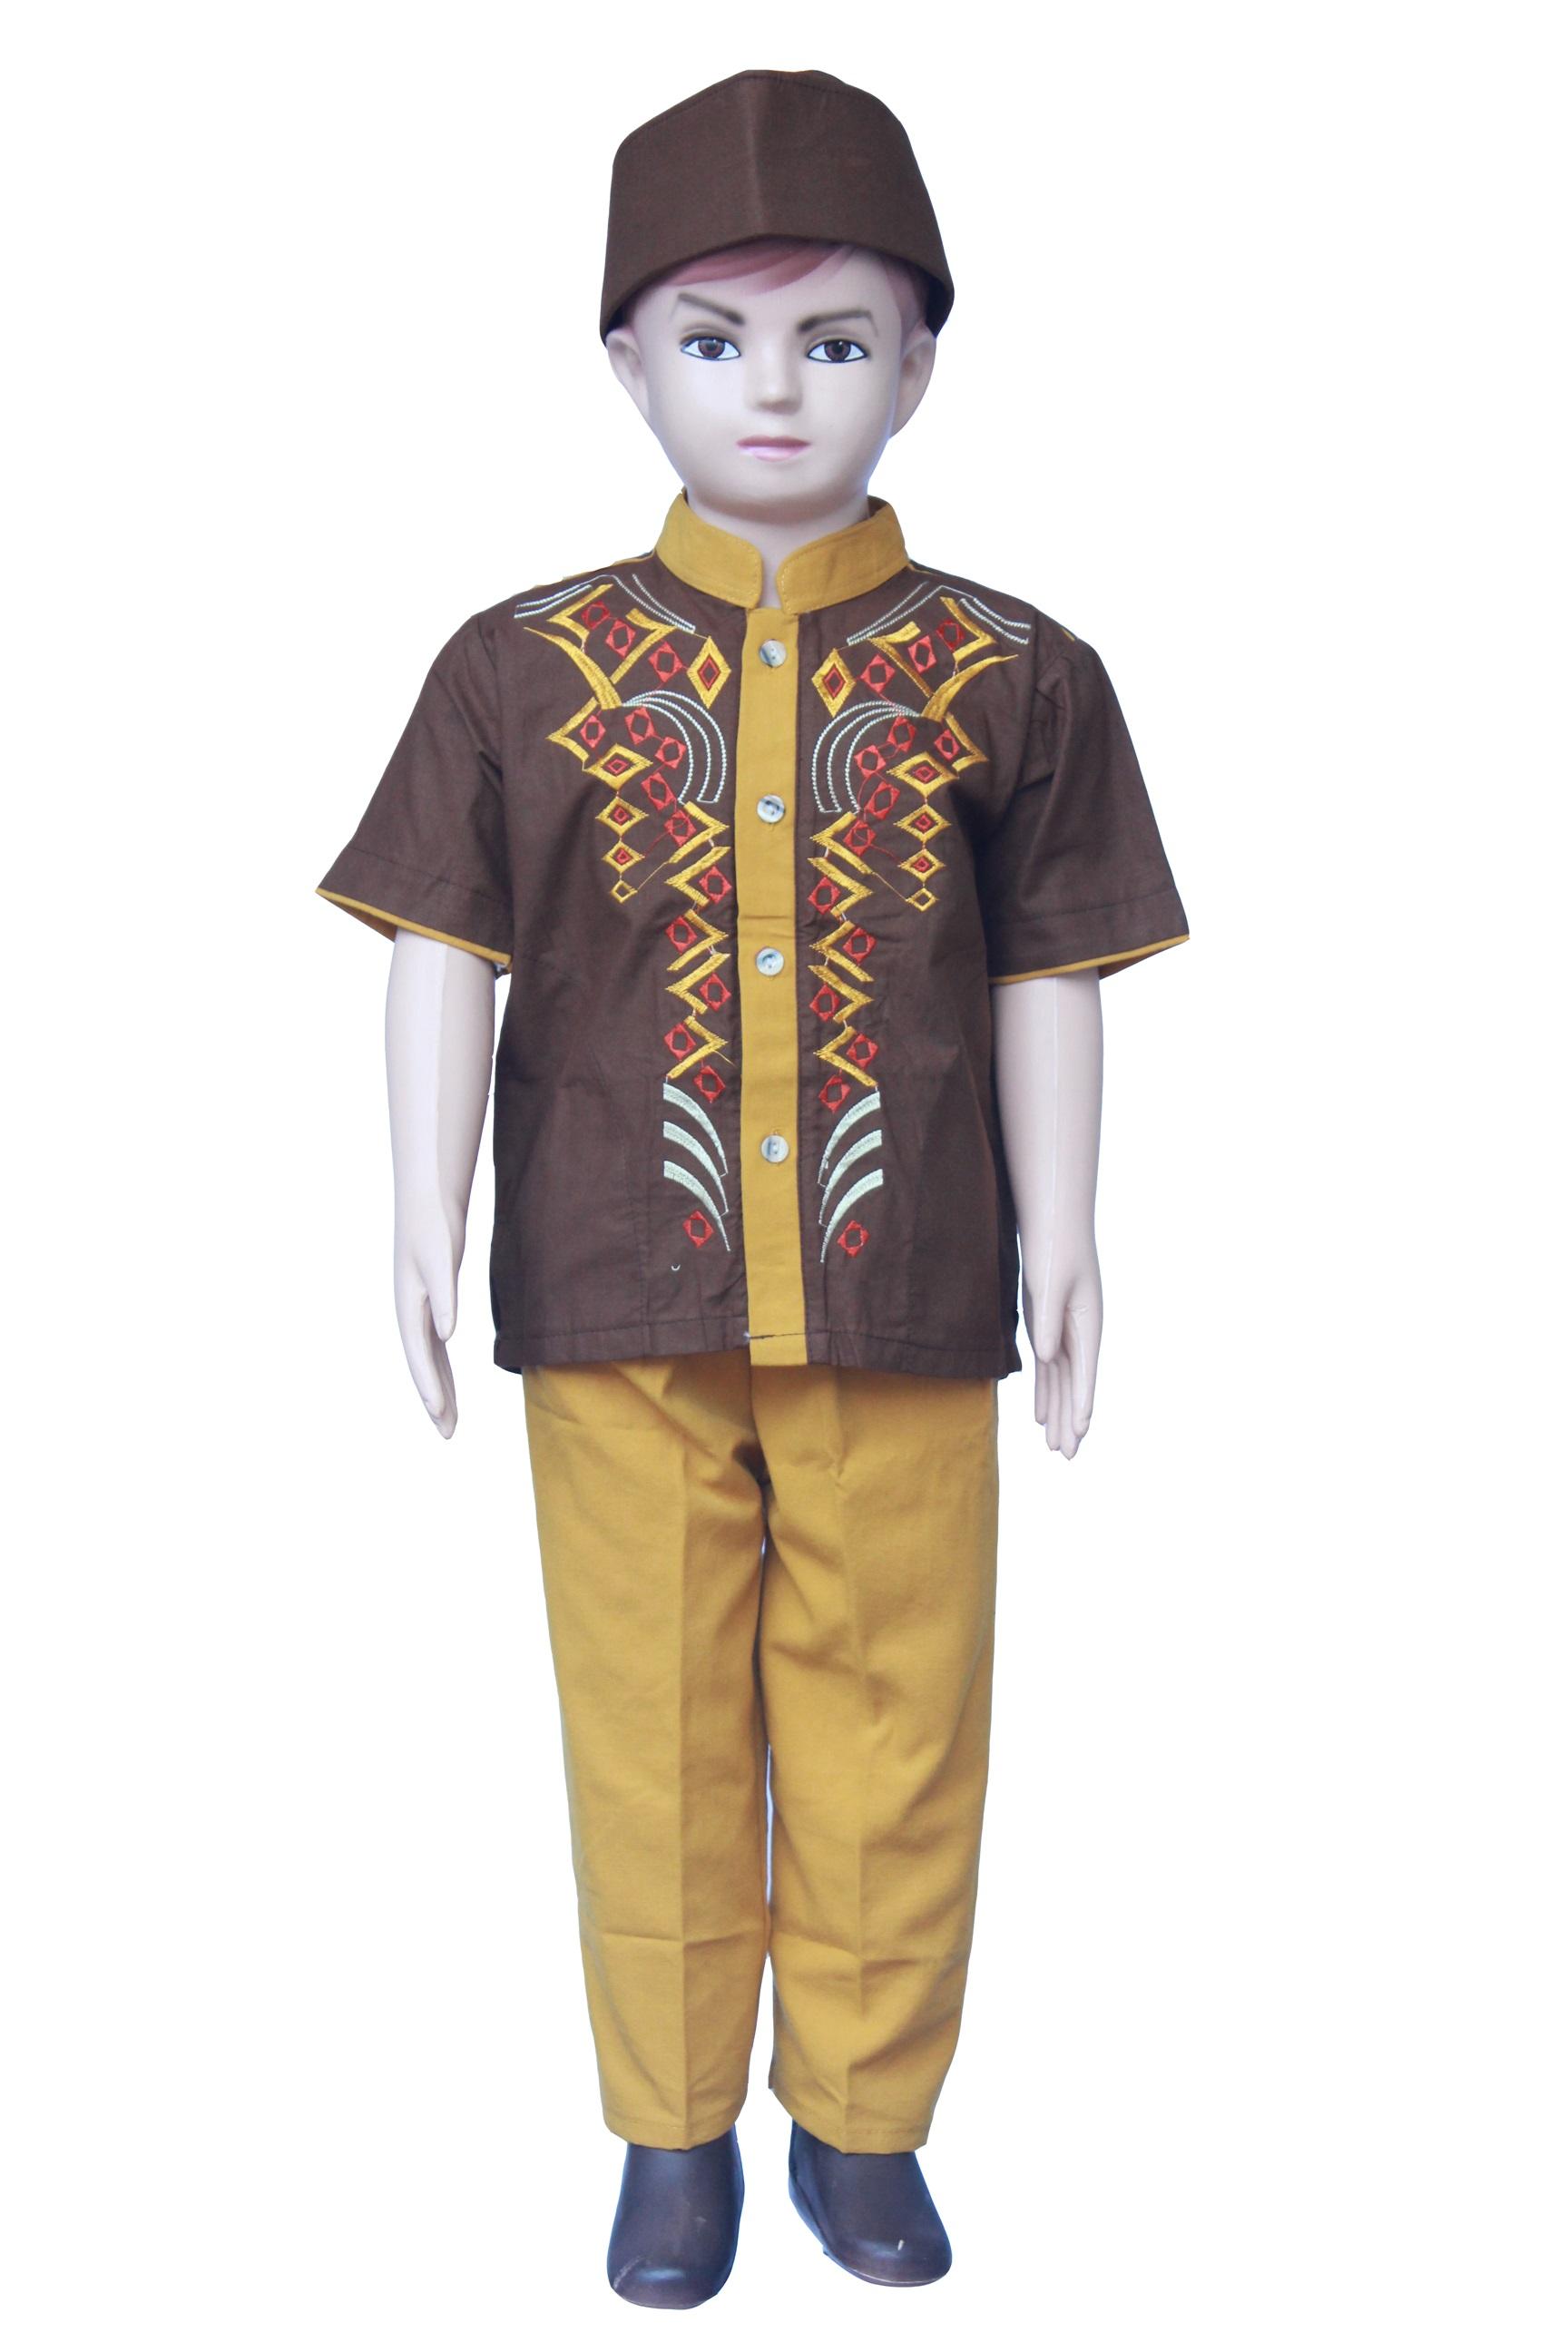 Setelan Baju Koko Anak Laki Laki Terbaru - KOKO B (2 - 3 tahun)